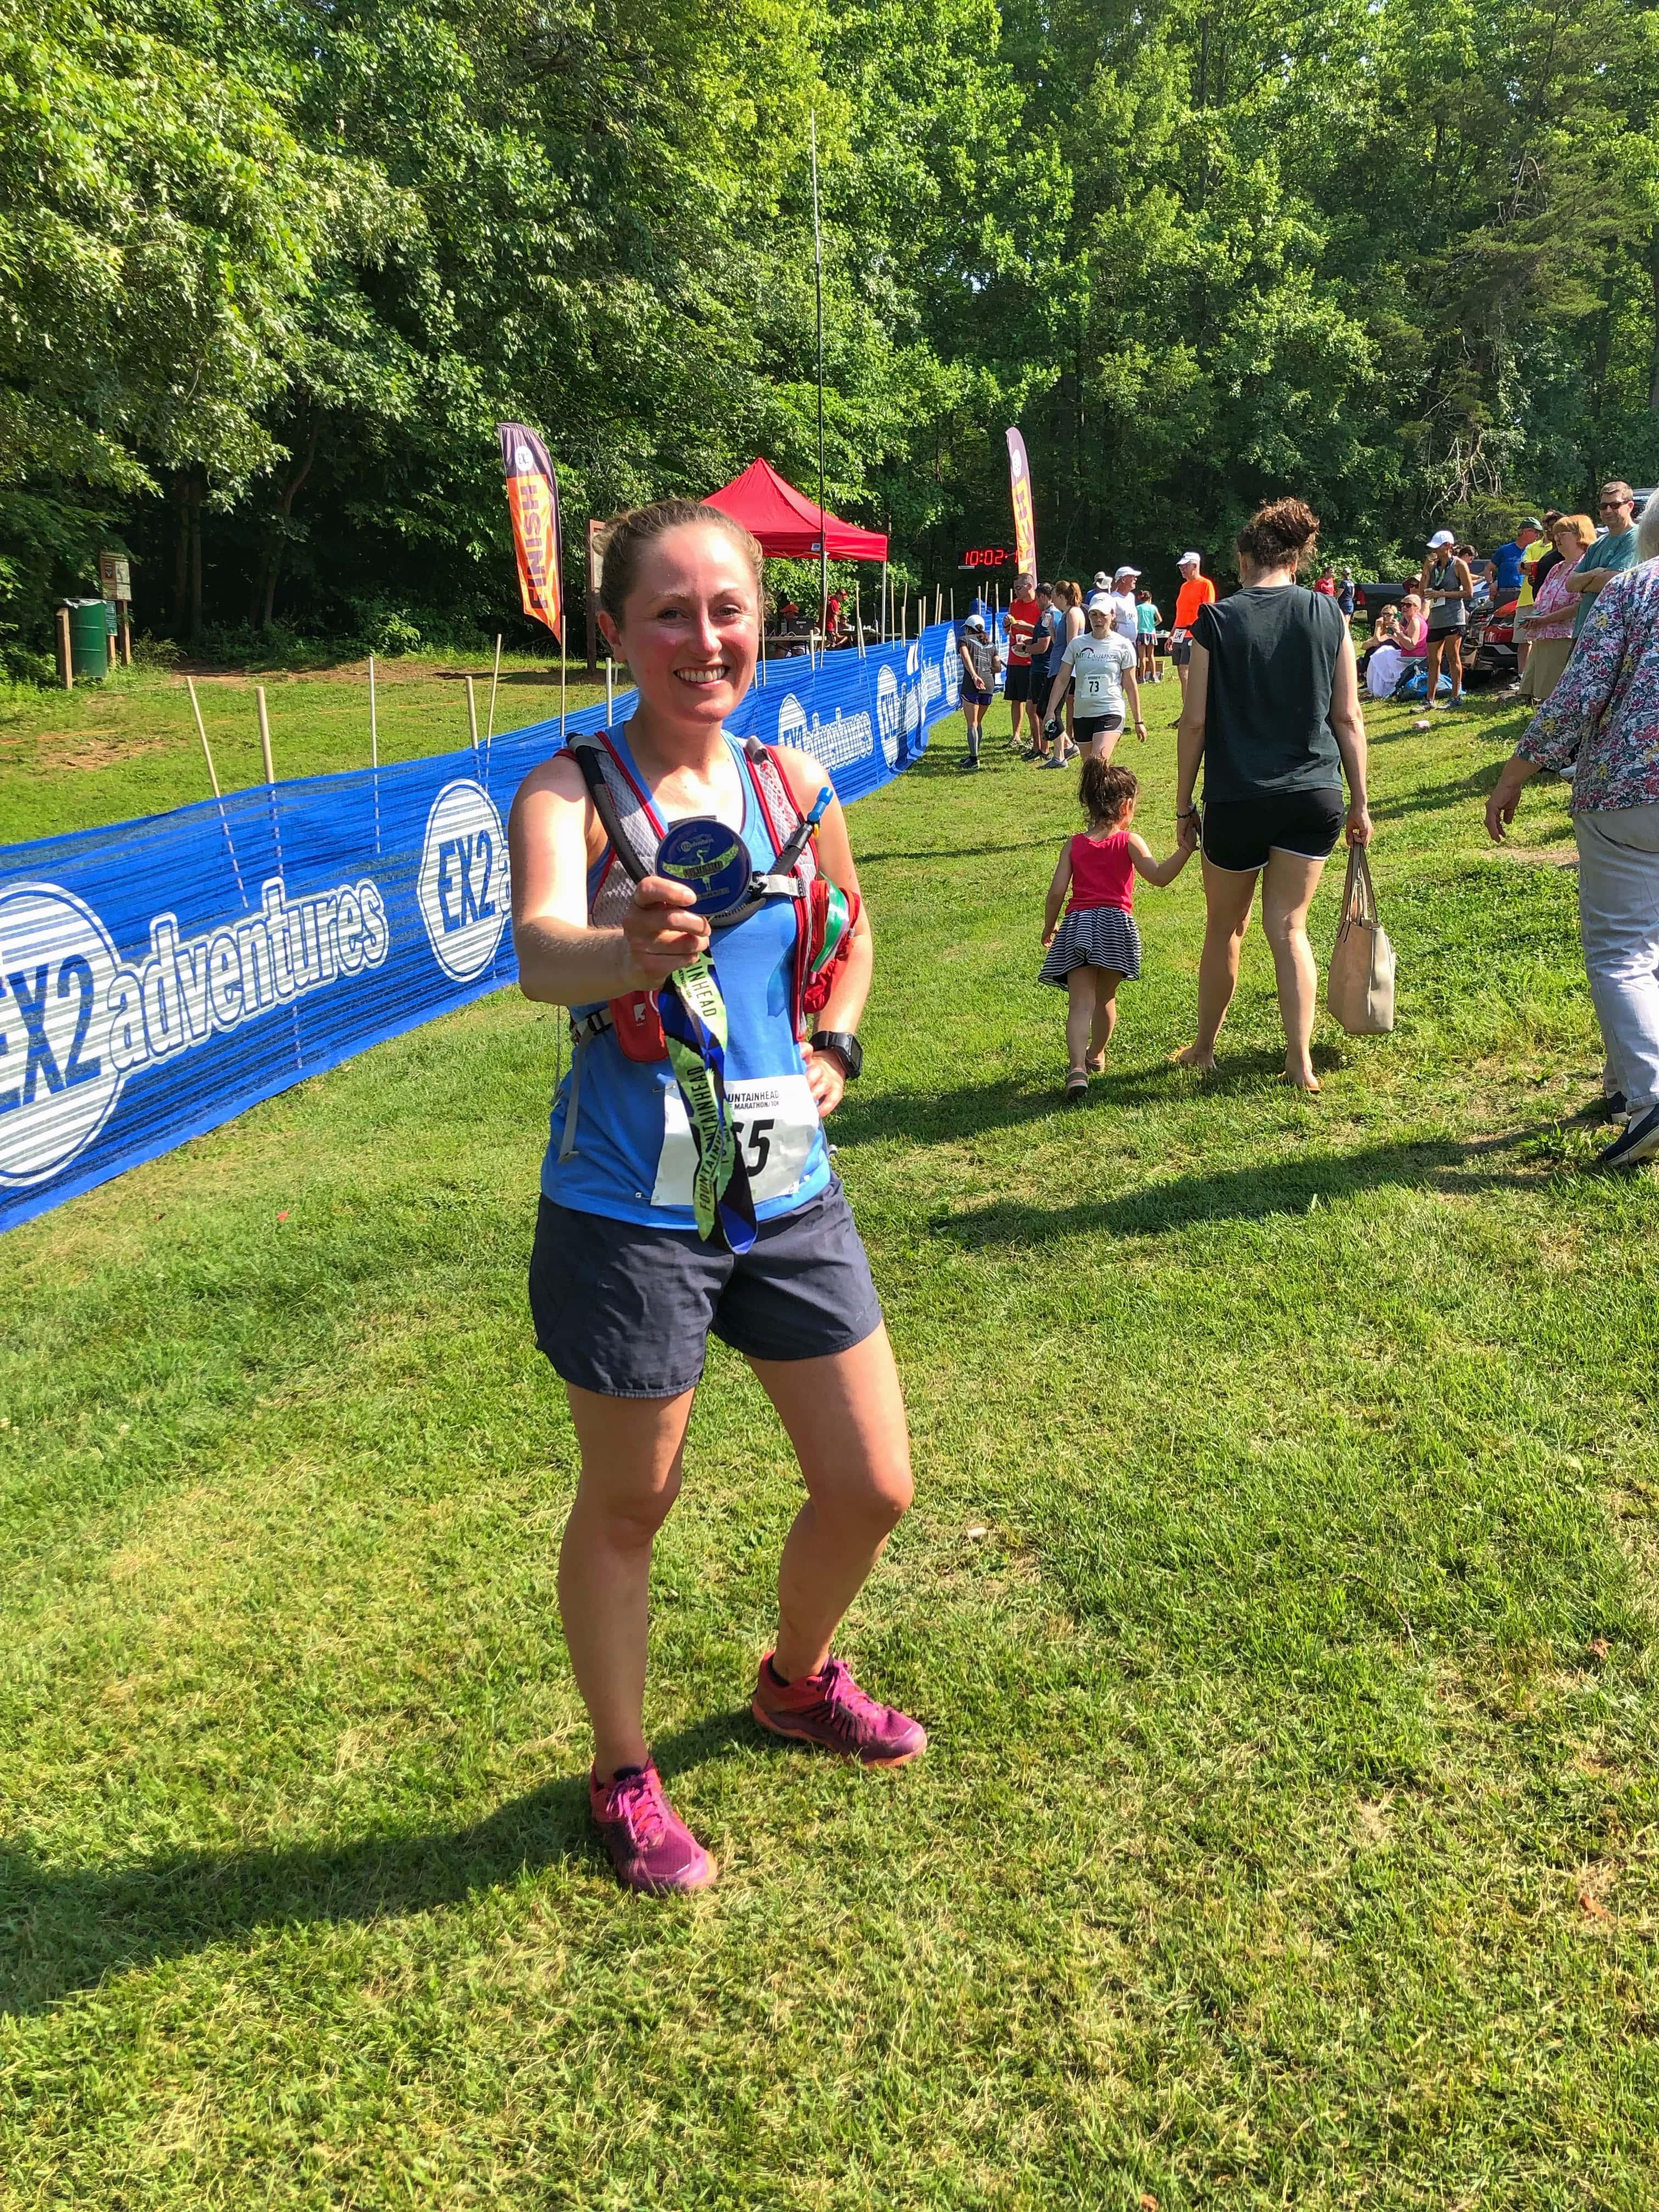 Fountainhead 10k Trail Run Race Recap